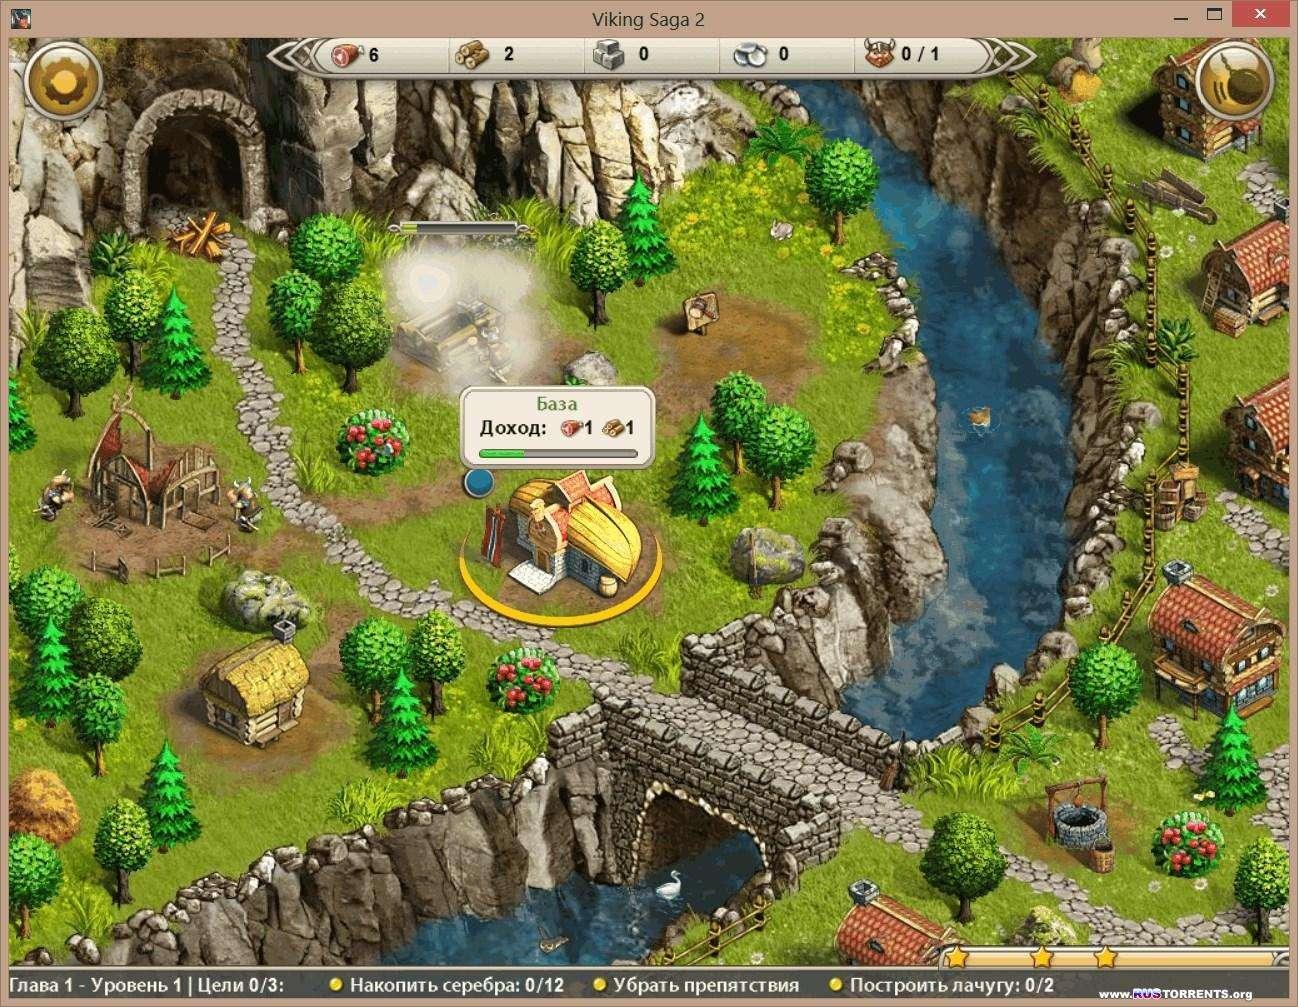 Сага о викинге 2. Новый свет | PC